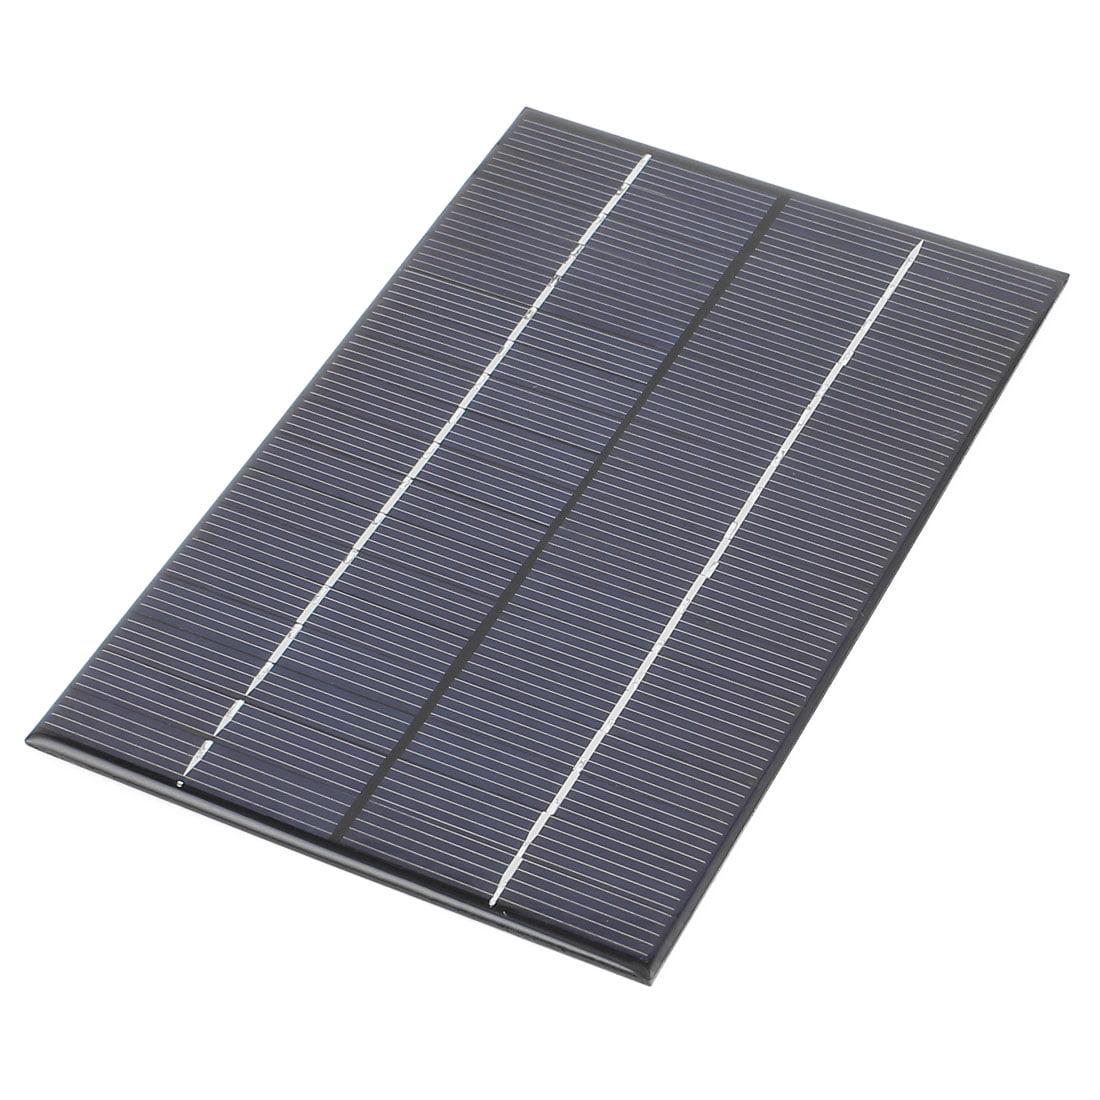 polycrystallinesilicon 18v 4 2w puissance panneau solaire. Black Bedroom Furniture Sets. Home Design Ideas